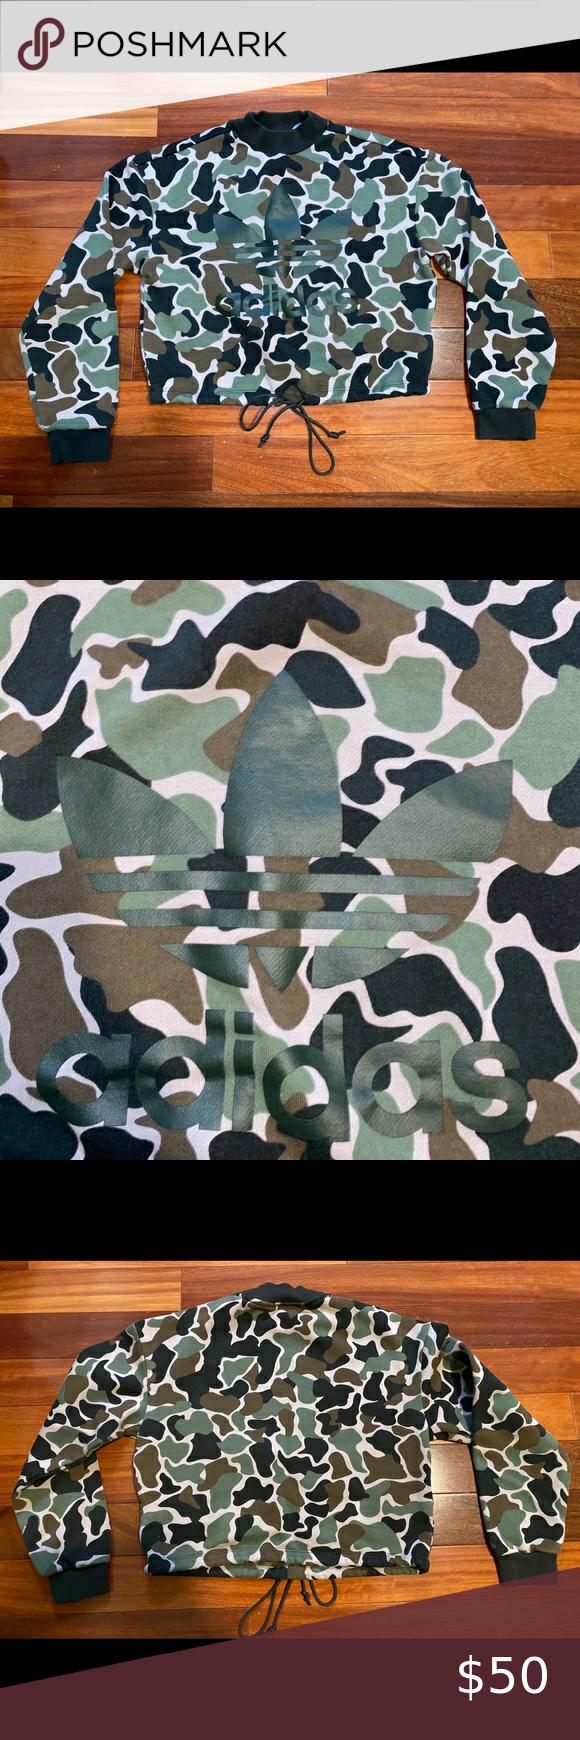 Predownload: Adidas Crew Neck Sweatshirt Camo Adidas Camo Crop Crew Neck Sweatshirt Brand New With Out Tags Women S Size Adidas Crew Neck Crew Neck Sweatshirt Adidas Camo [ 1740 x 580 Pixel ]